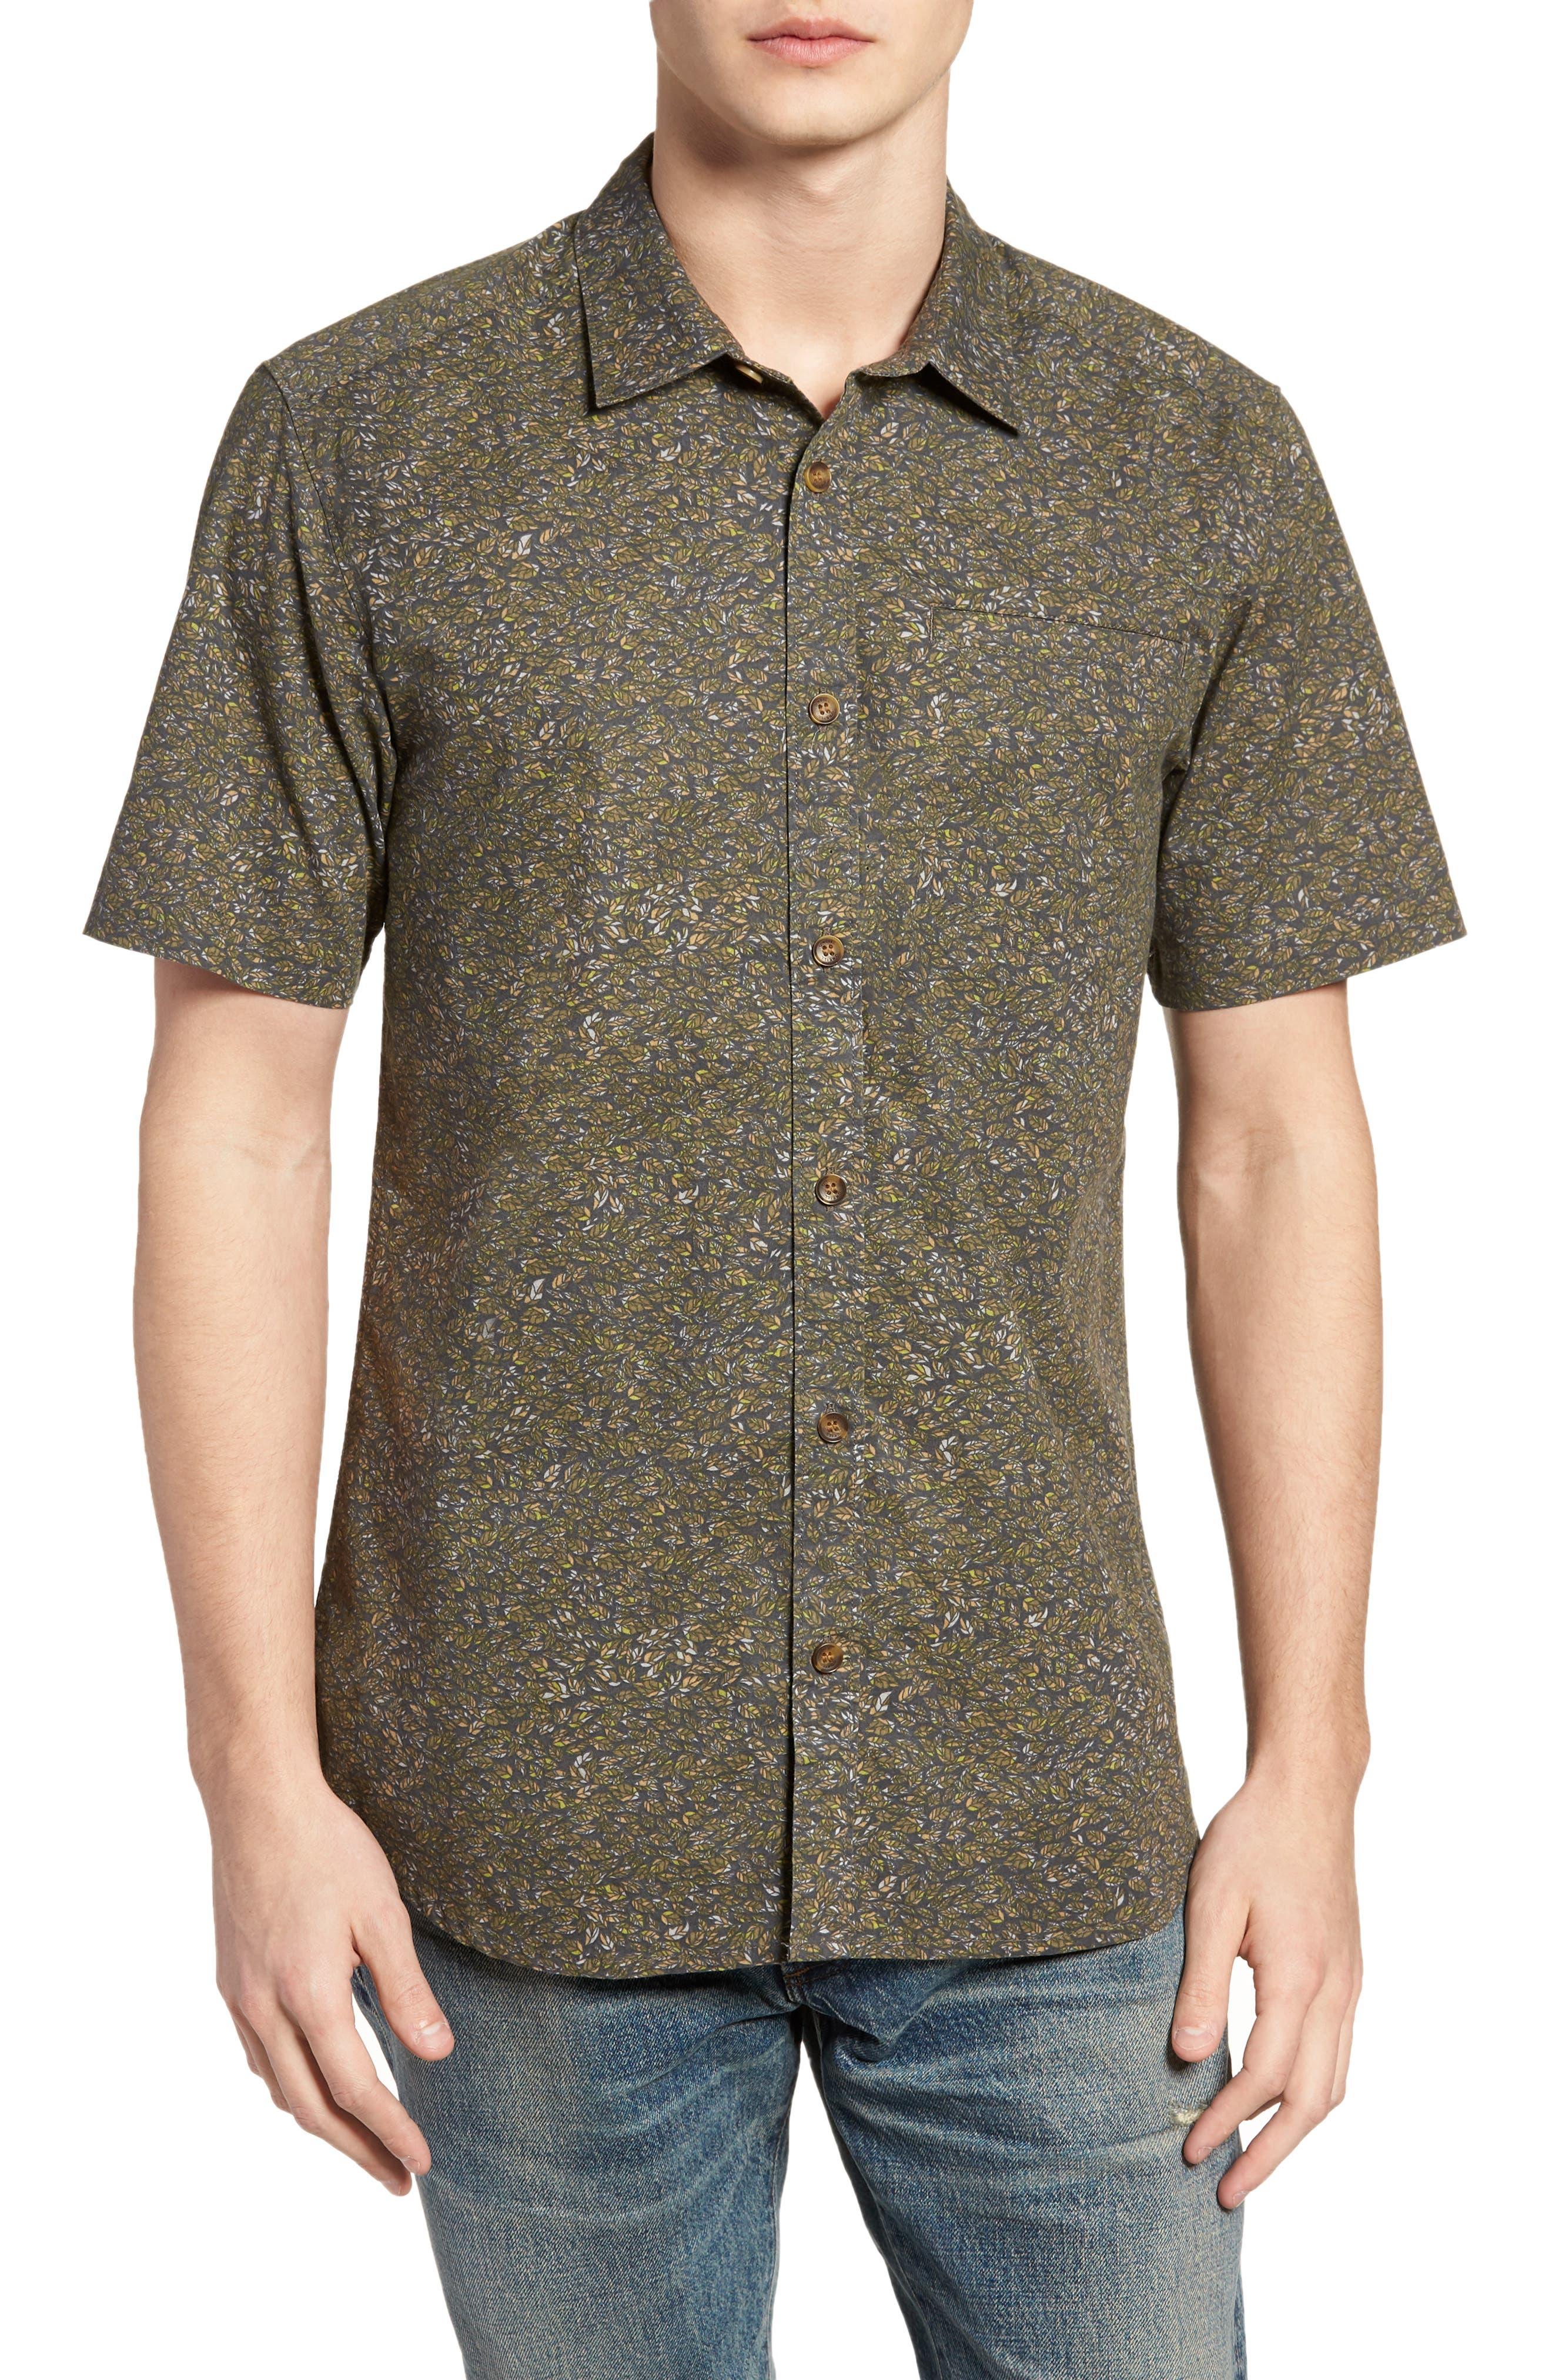 Livingston Short Sleeve Shirt,                             Main thumbnail 1, color,                             020